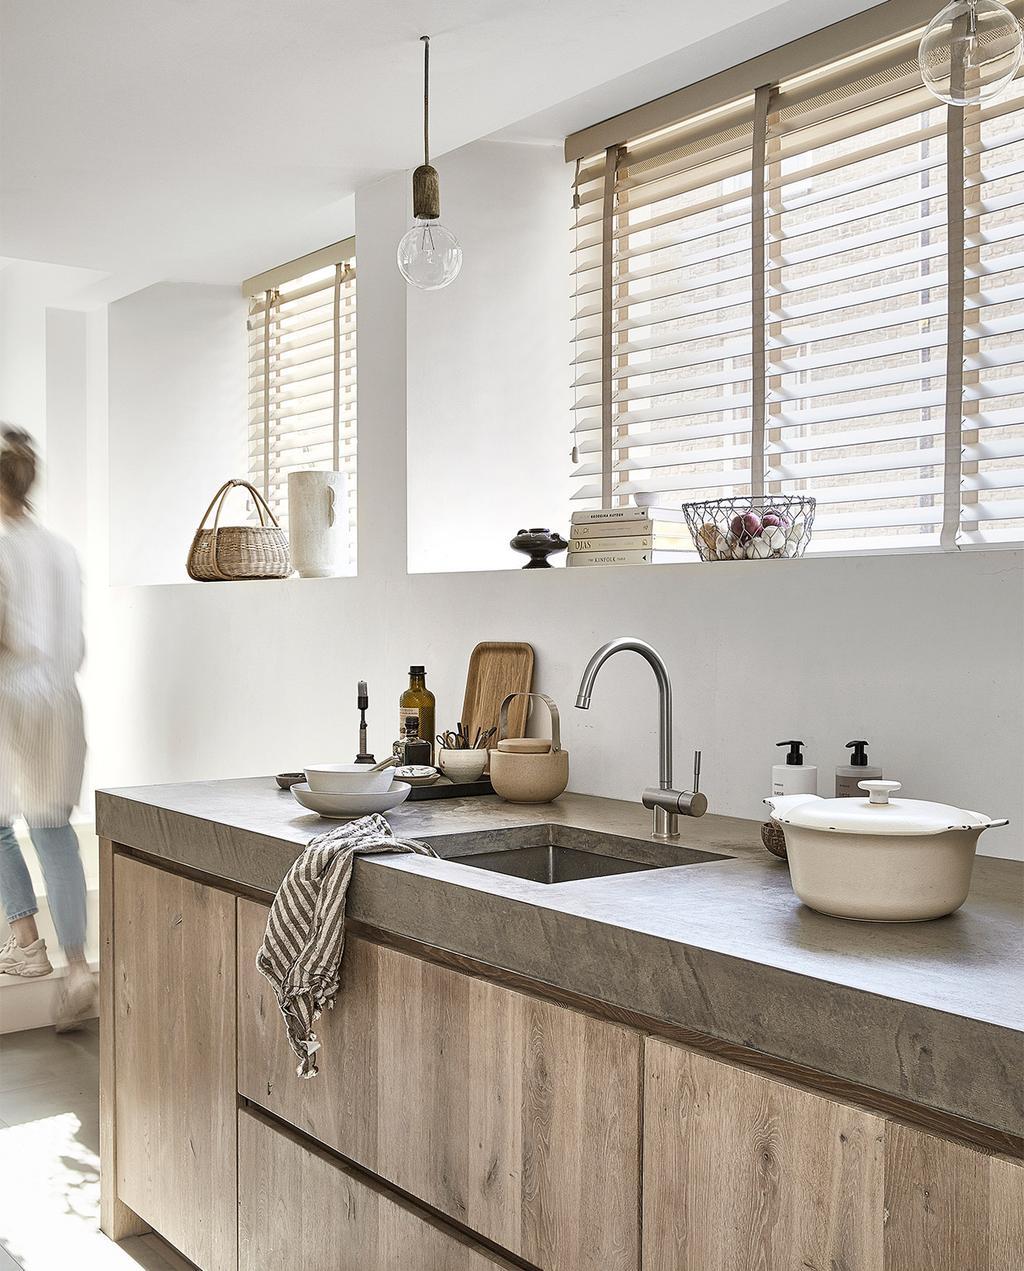 vtwonen 09-2021 | jaloezieën in lichte kleur bij houten keuken